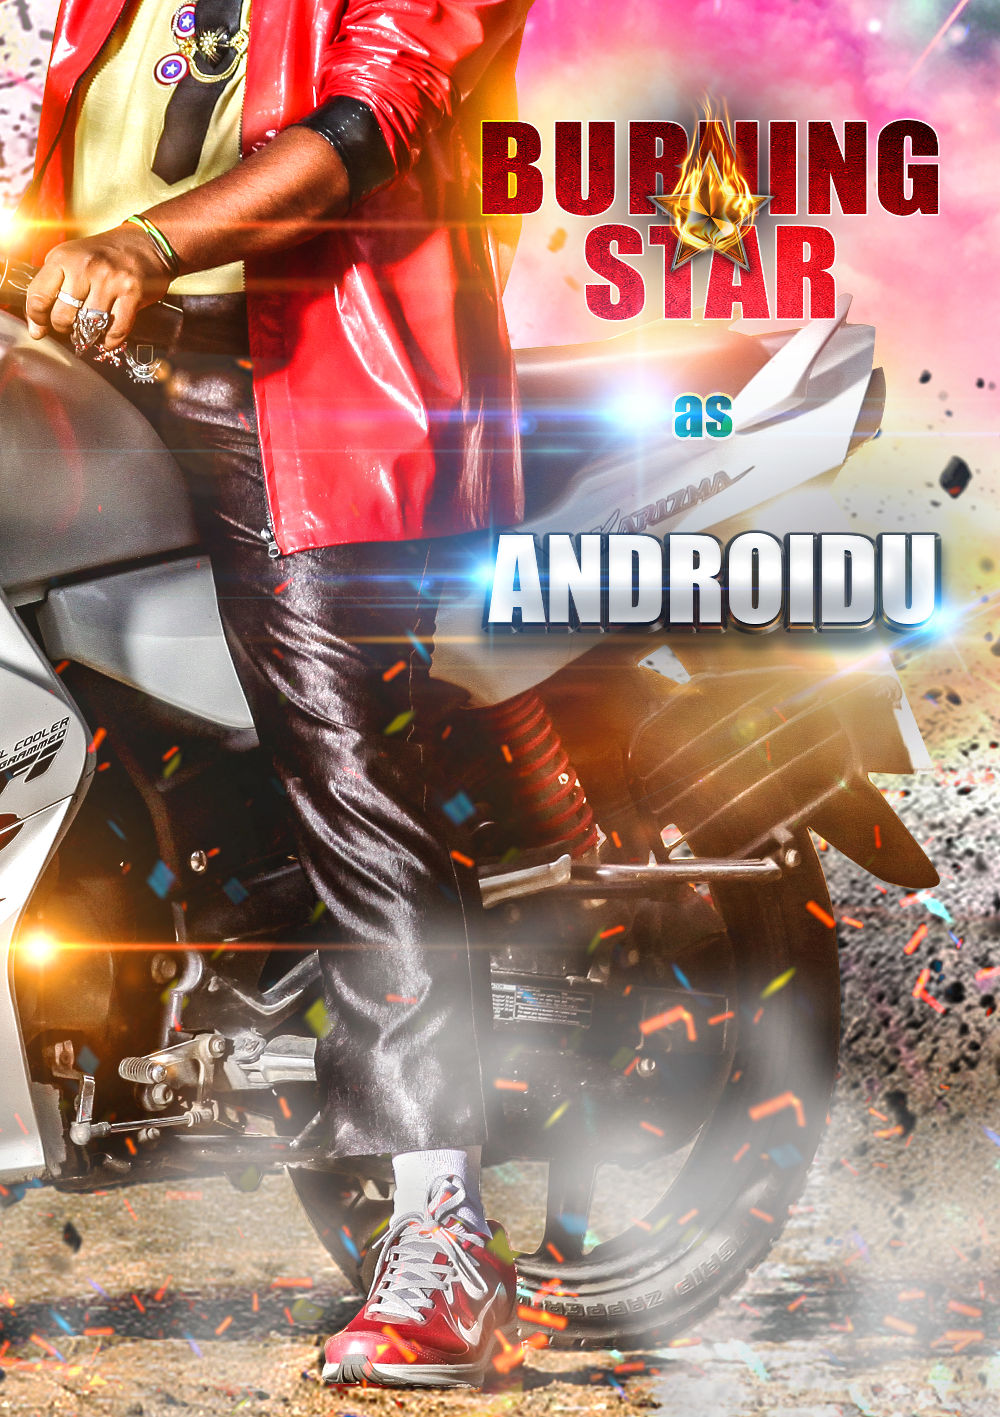 Sampoornesh Babu's Kobbari Matta Movie Androidu First Look Teaser Poster